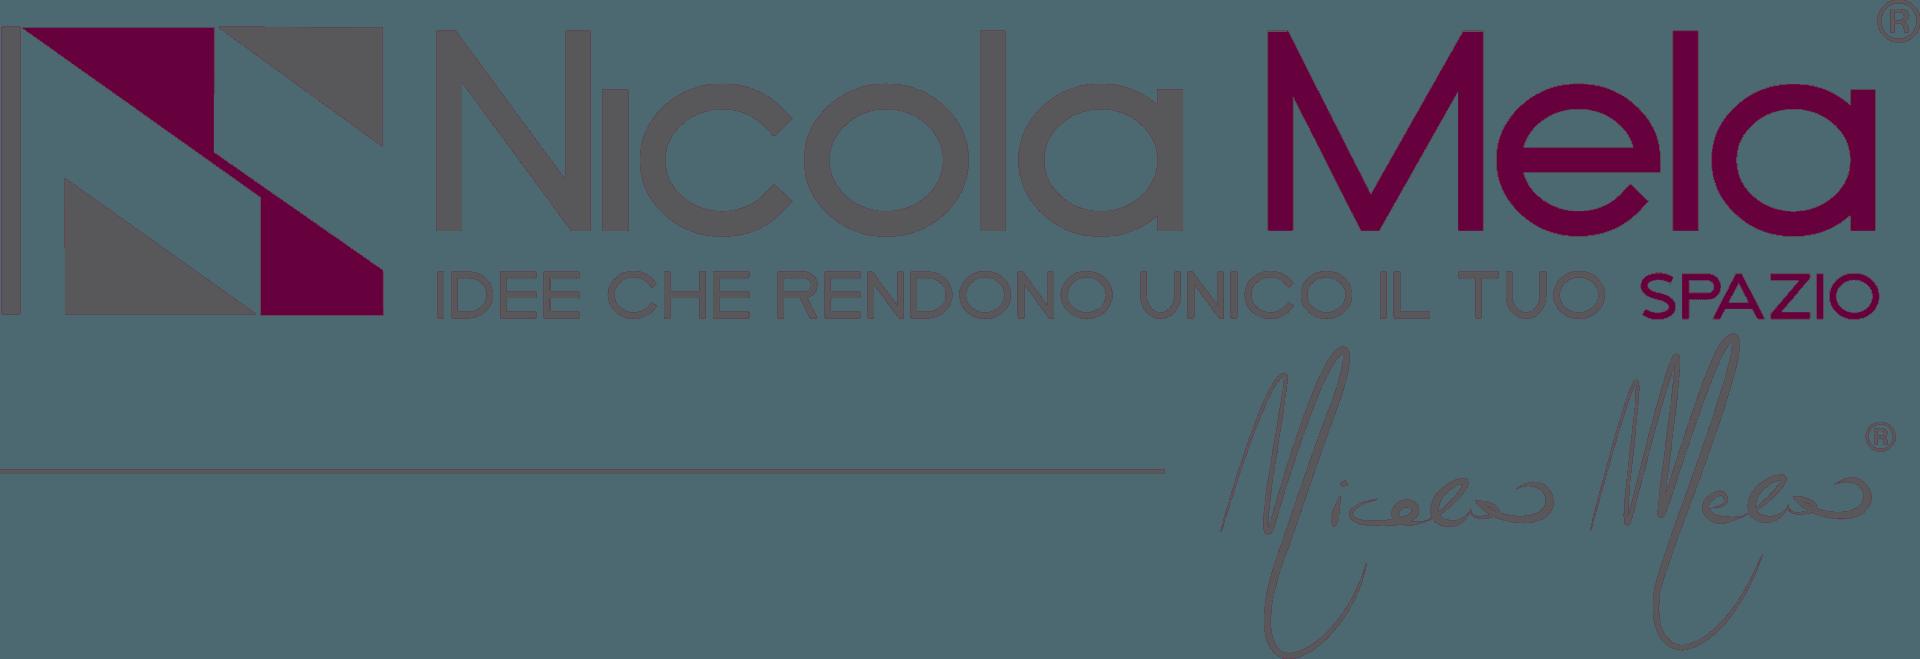 Nicola Mela logo